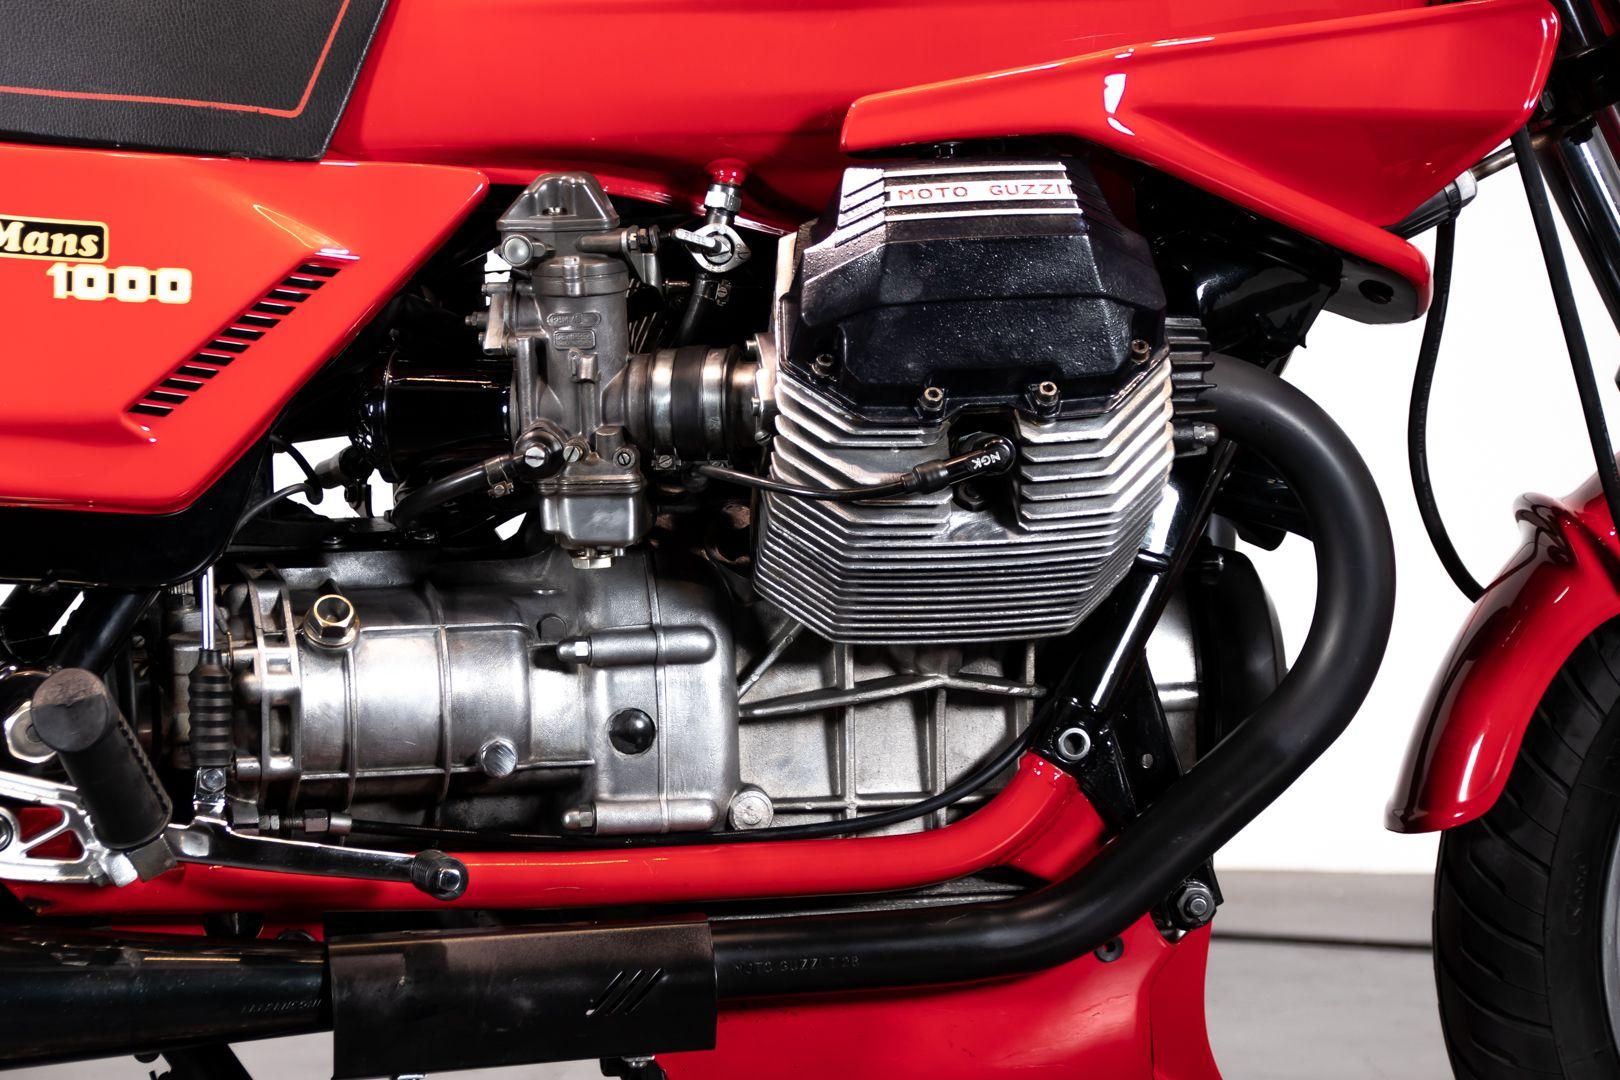 1985 Moto Guzzi le mans 1000 57533